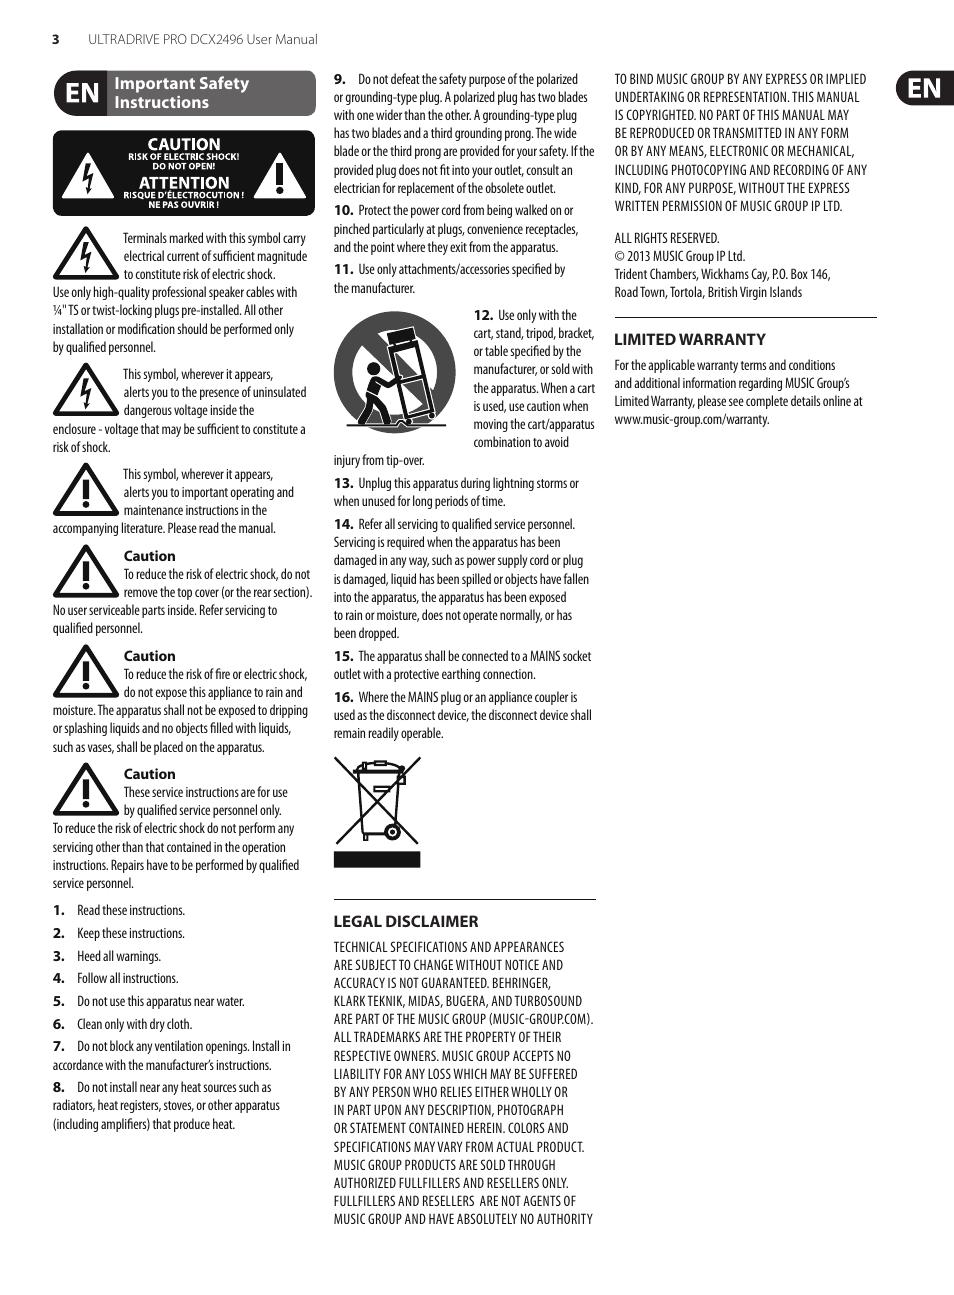 behringer ultradrive pro dcx2496 user manual page 3 35 rh manualsdir com Behringer Ultradrive Pro DCX2496 Manual behringer ultradrive pro dcx2496 user manual